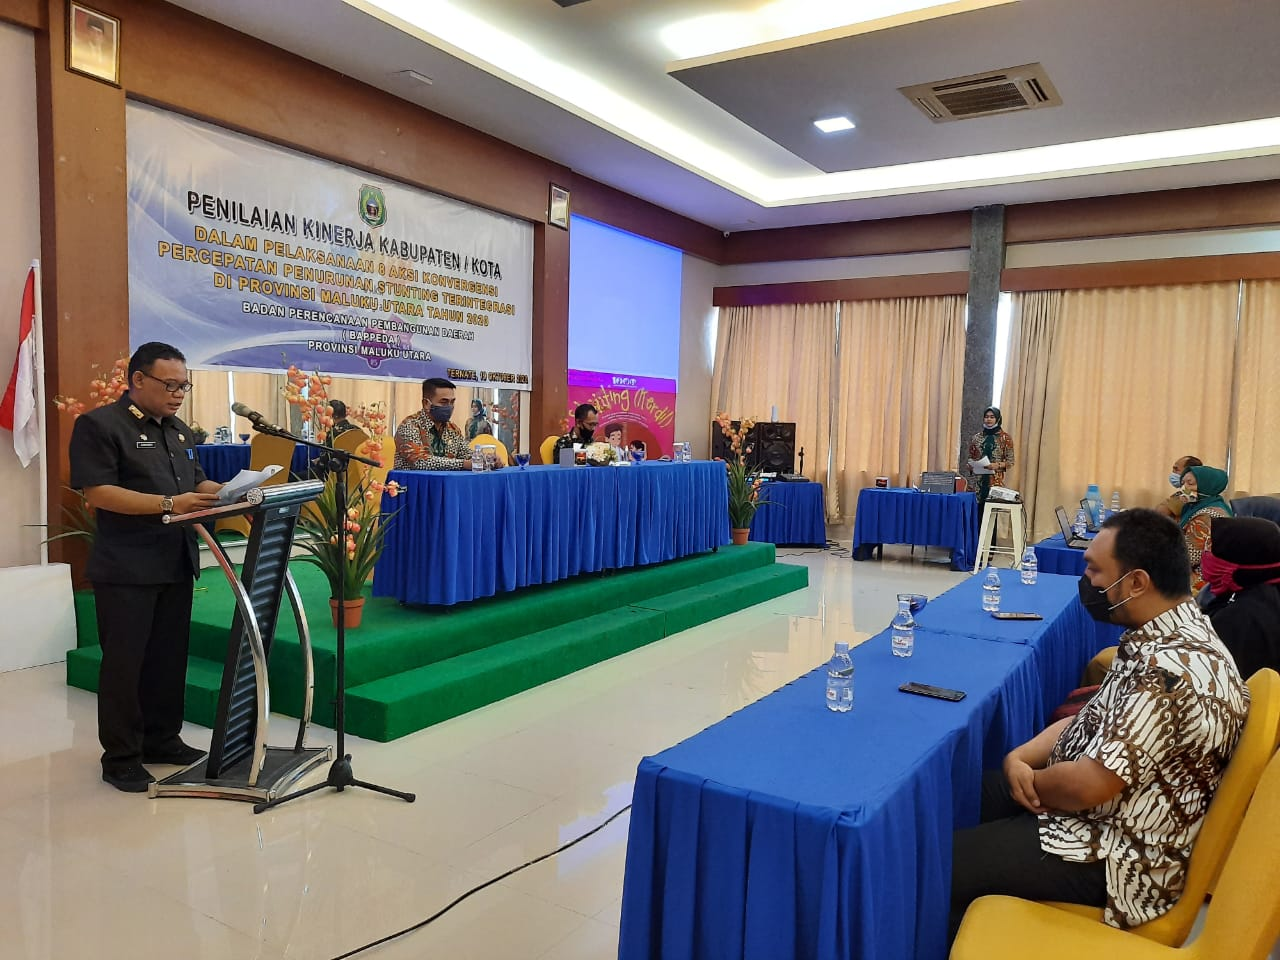 Sekprov Buka Kegiatan Penilaian Kinerja Kabupaten 8 Aksi Konvergensi Percepatan Penurunan Stunting di Malut